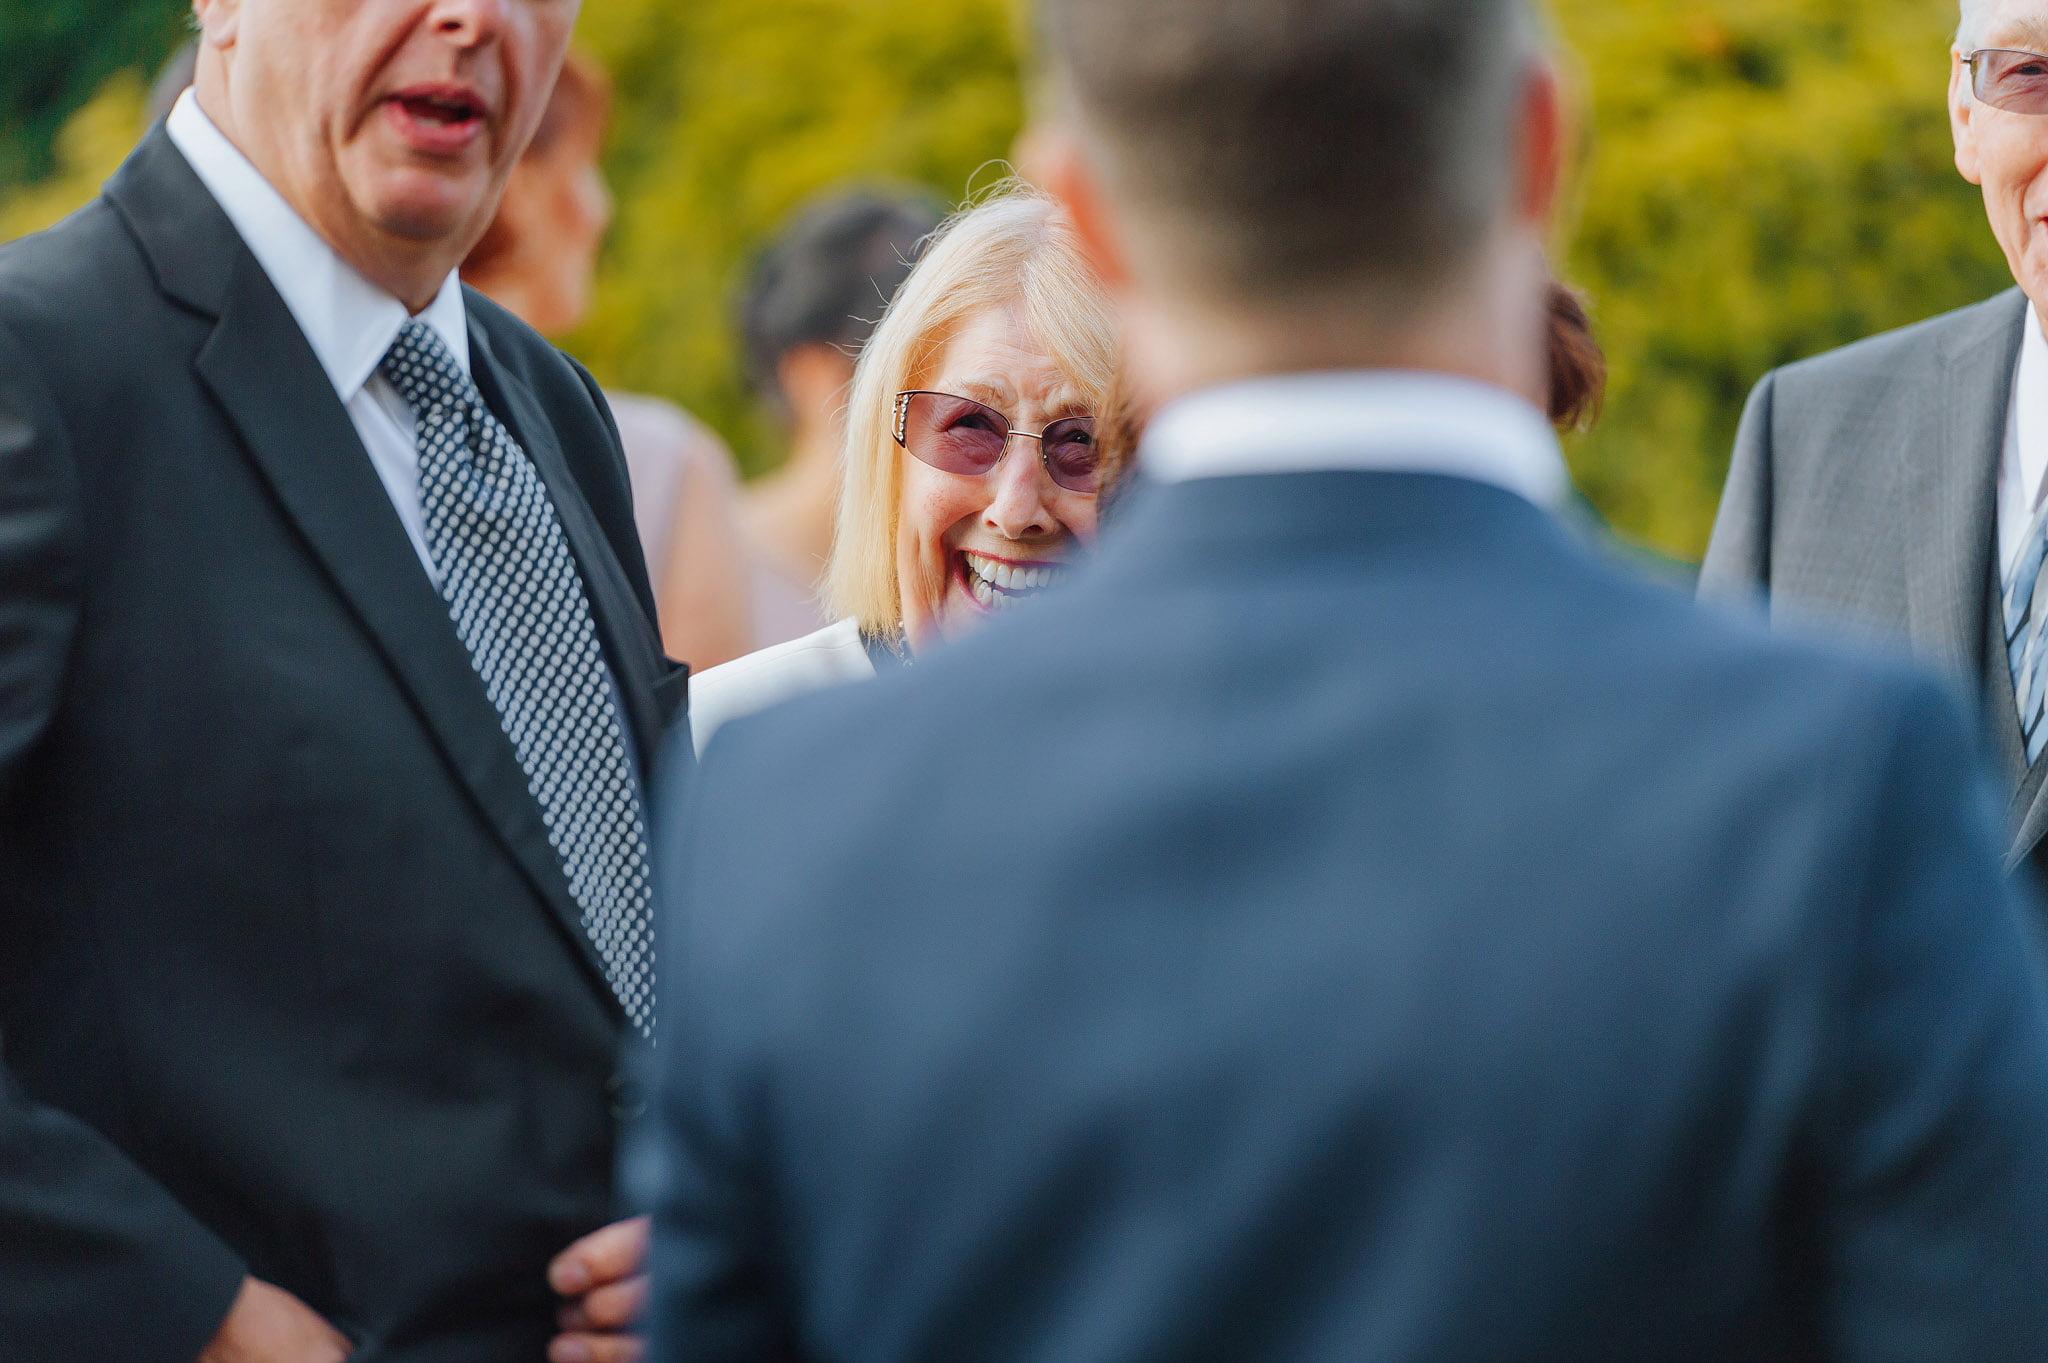 Coombe Abbey wedding in Coventry, Warwickshire - Sam + Matt 23